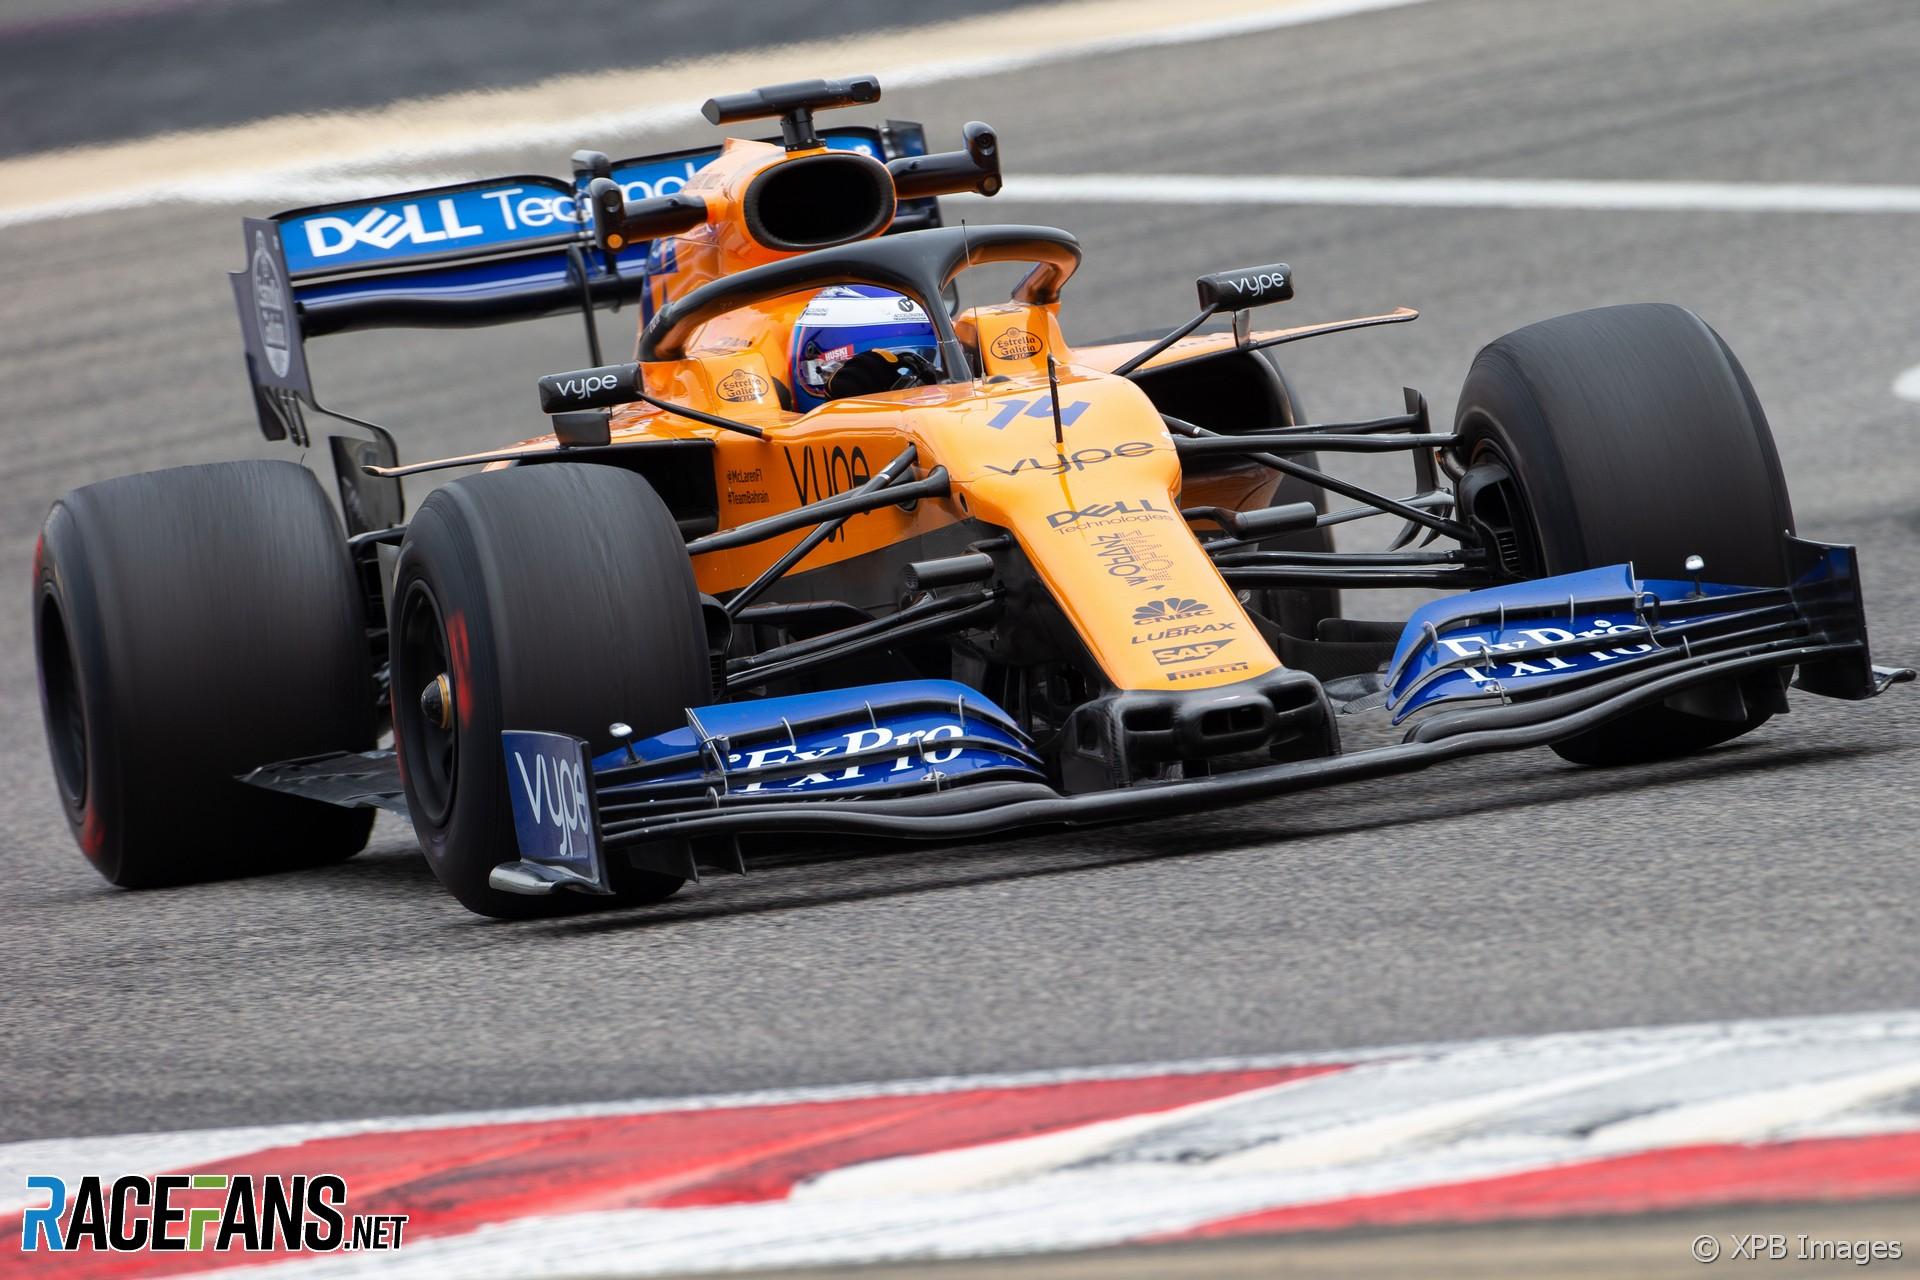 Fernando Alonso, McLaren, Bahrain International Circuit